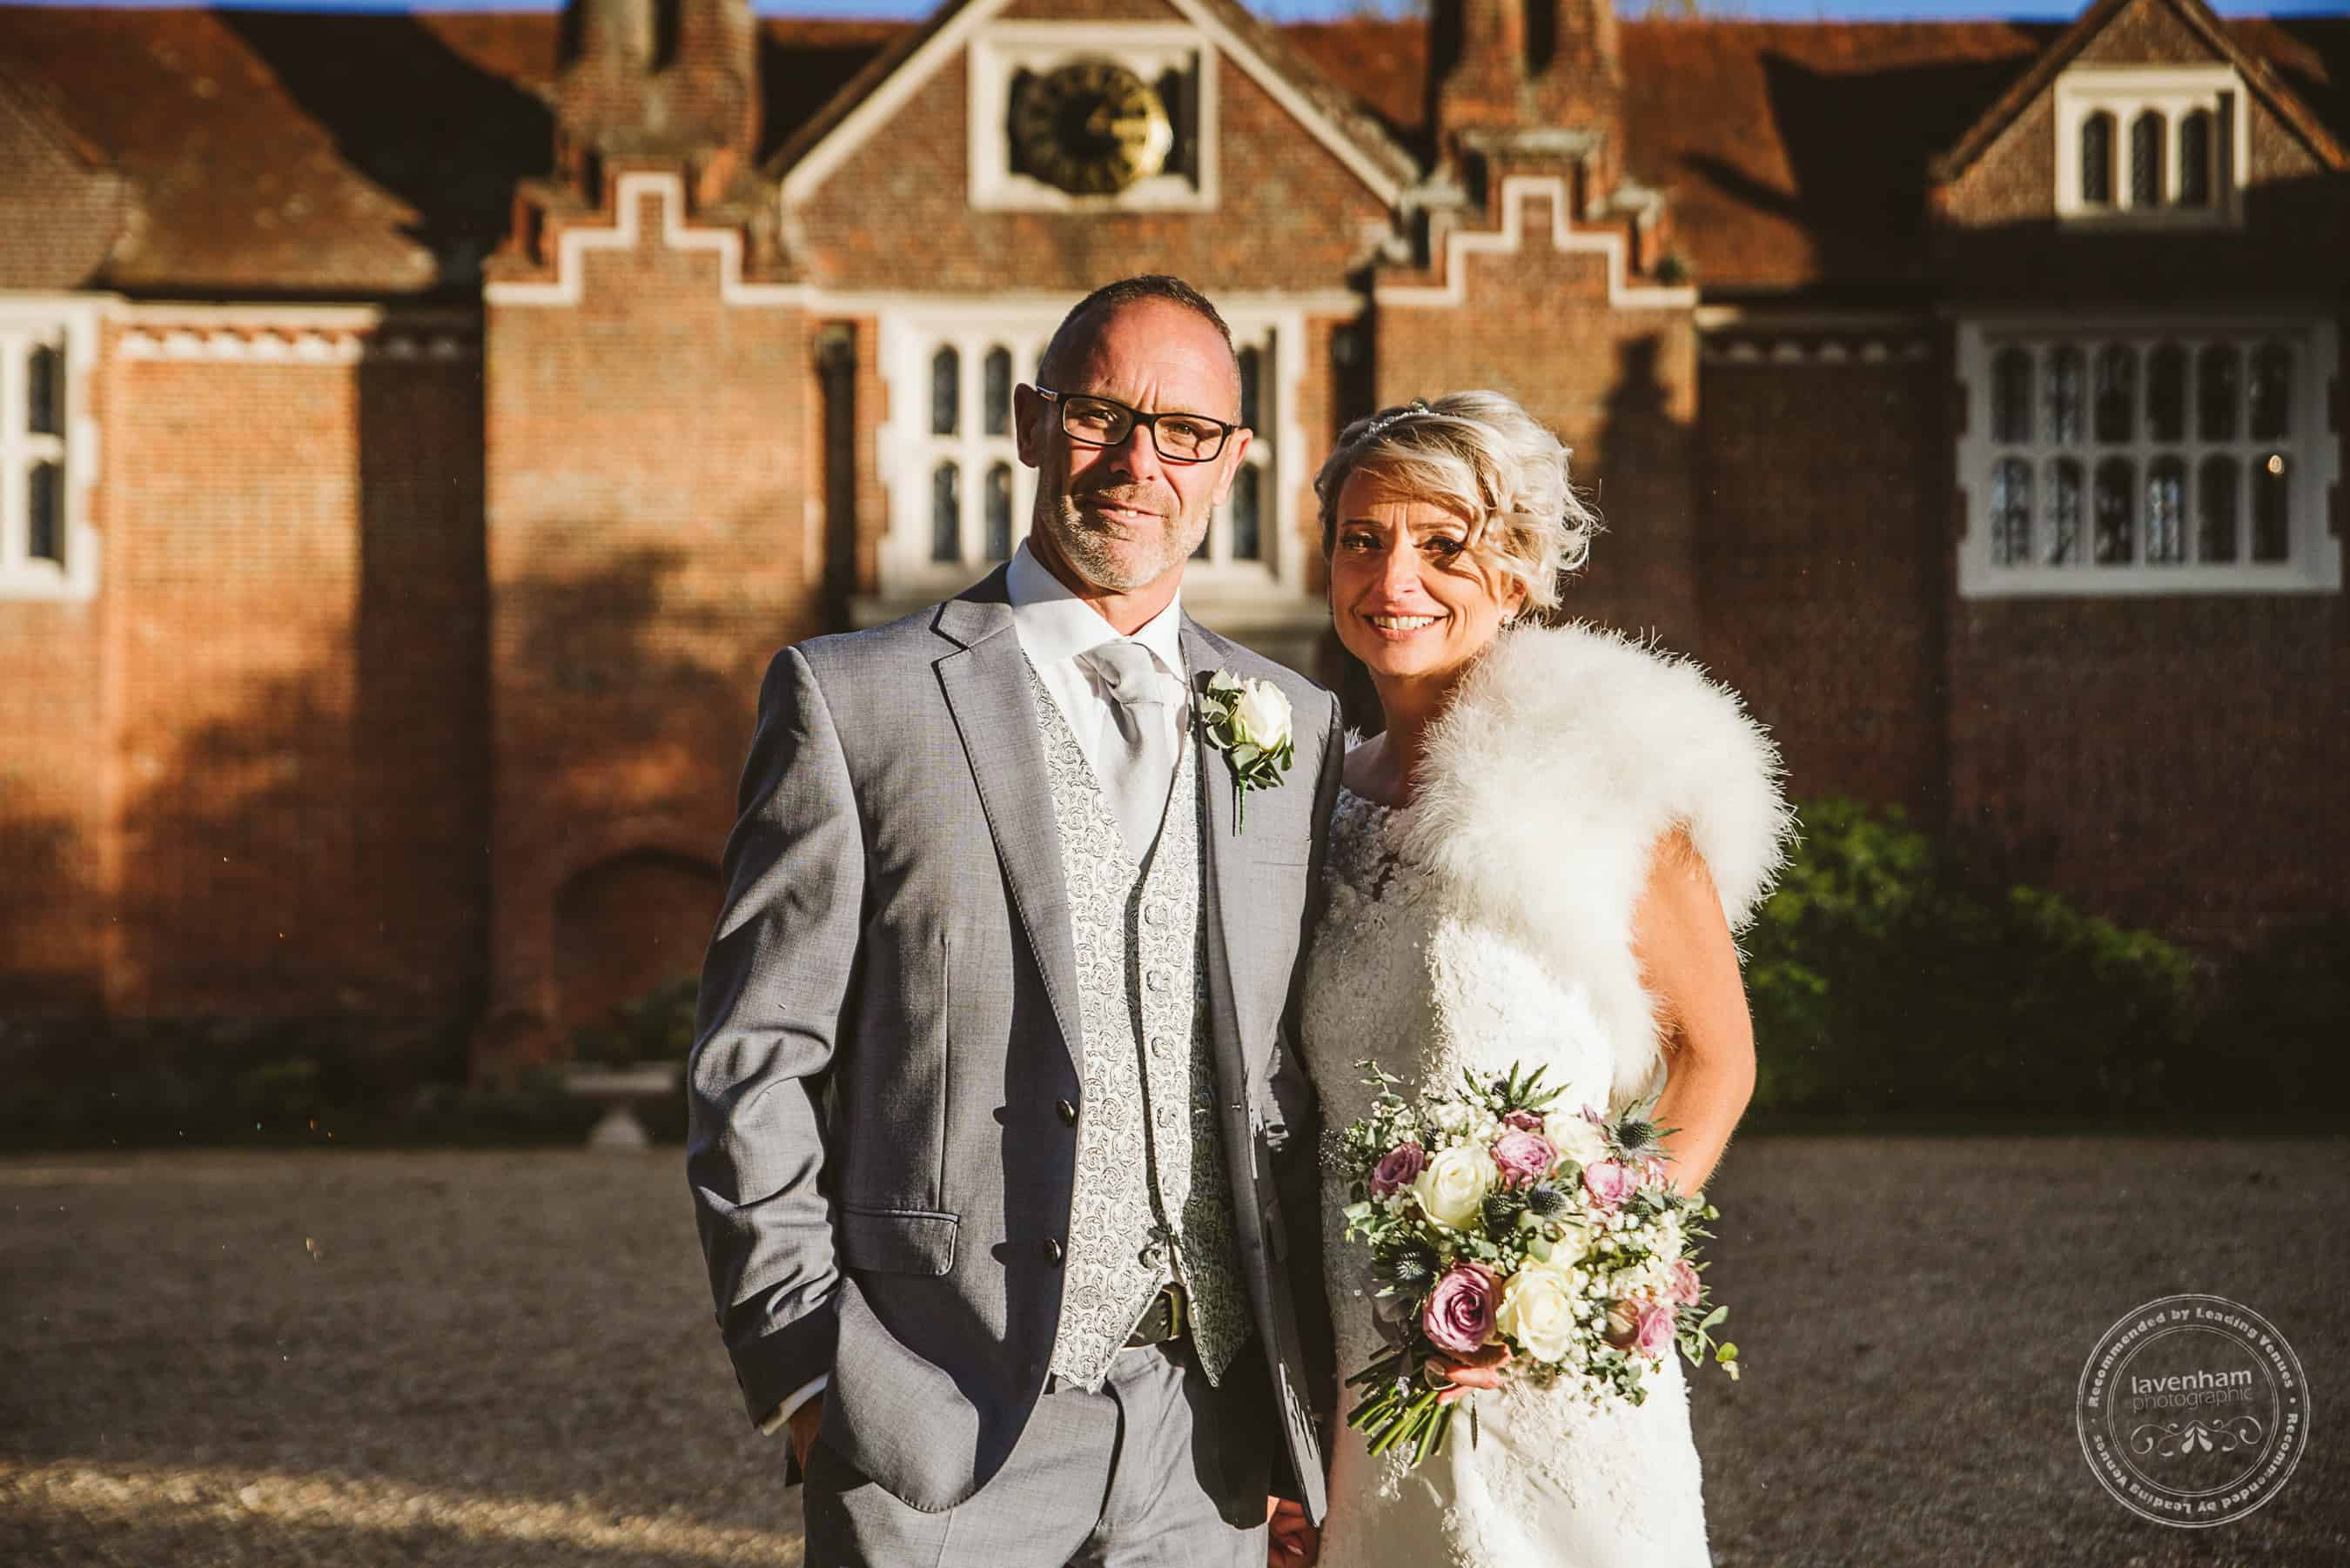 281018 Gosfield Hall Wedding Photography Lavenham Photographic 086